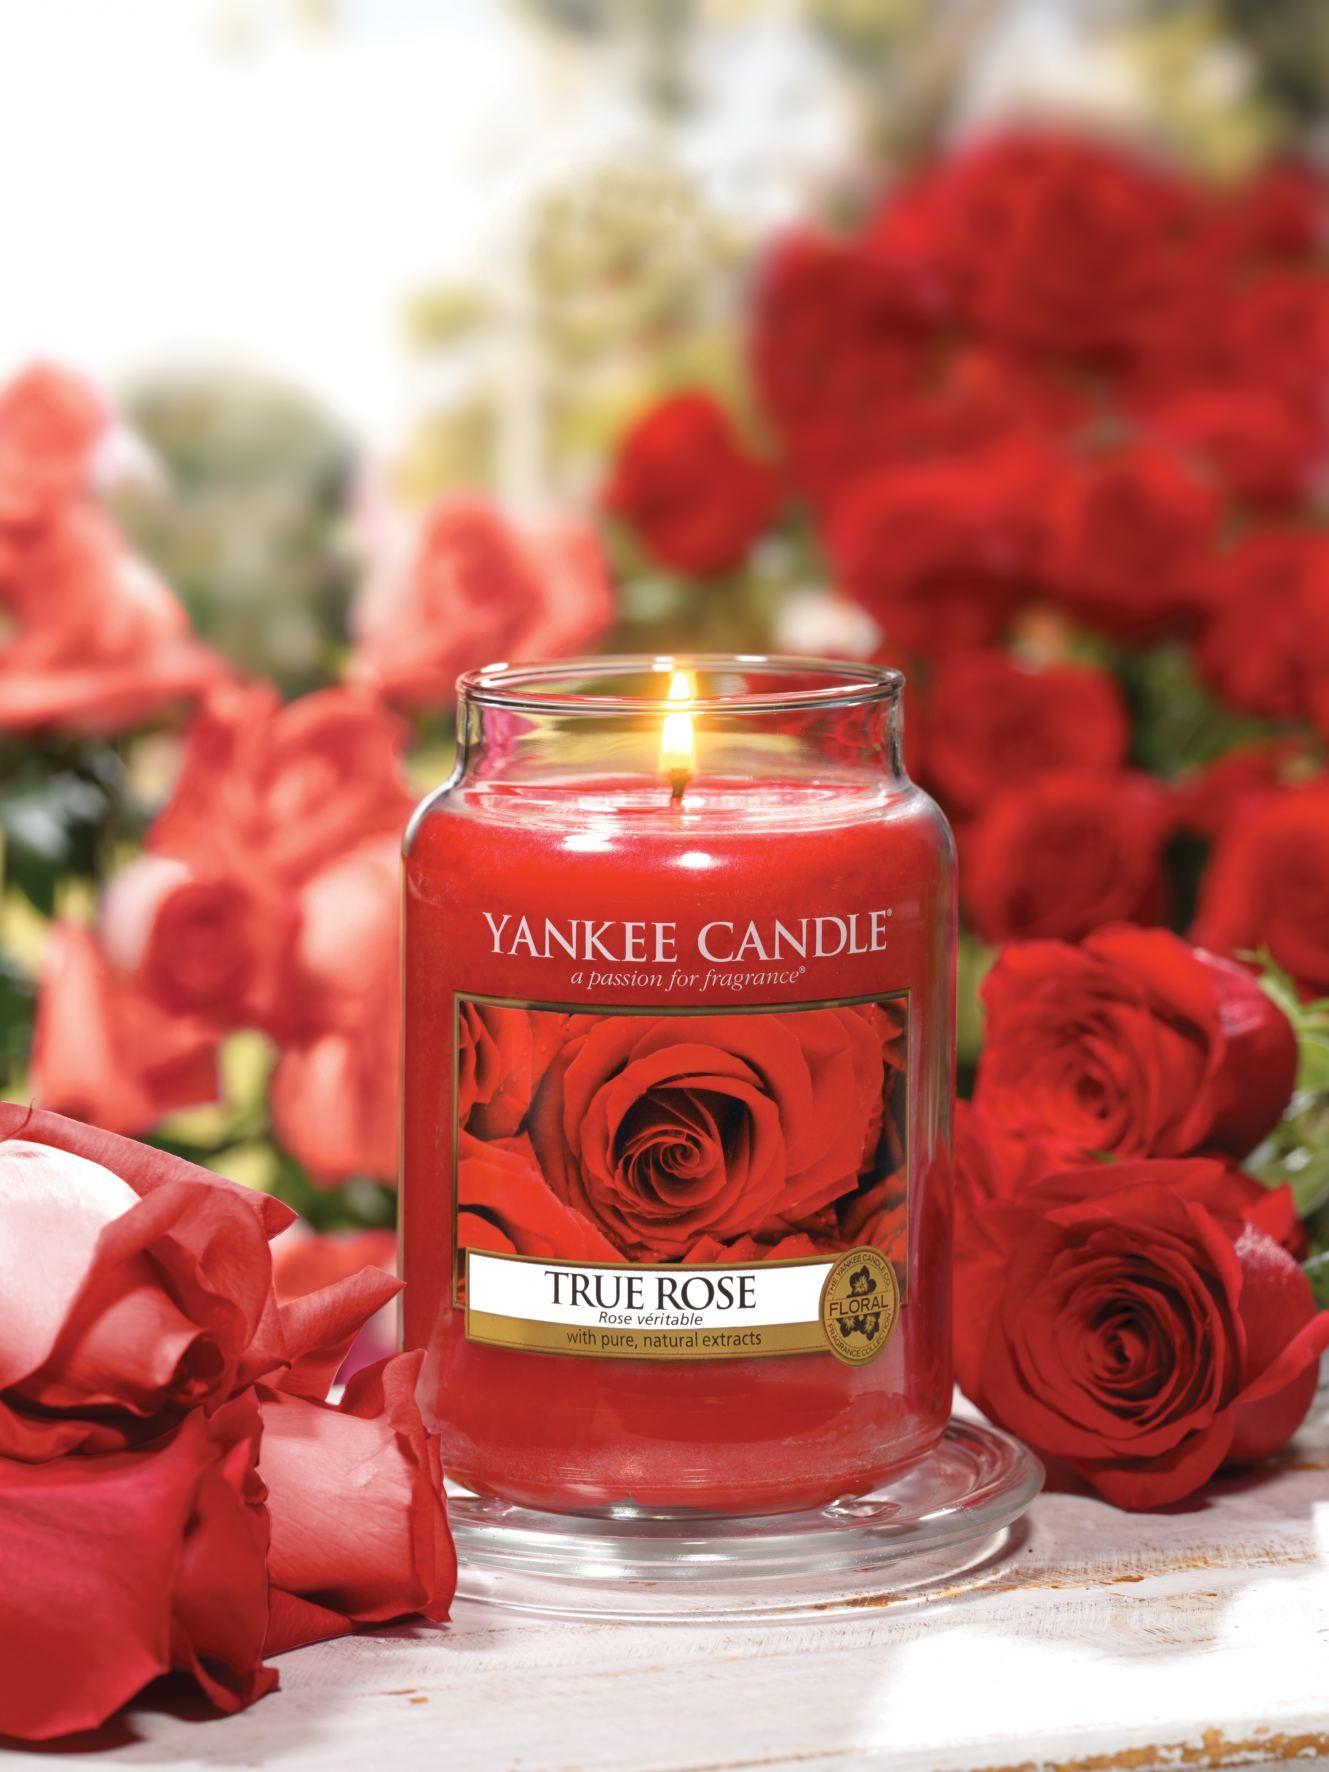 Yankee Candle True Rose Http Eshop Vasekuchyne Cz Yankee